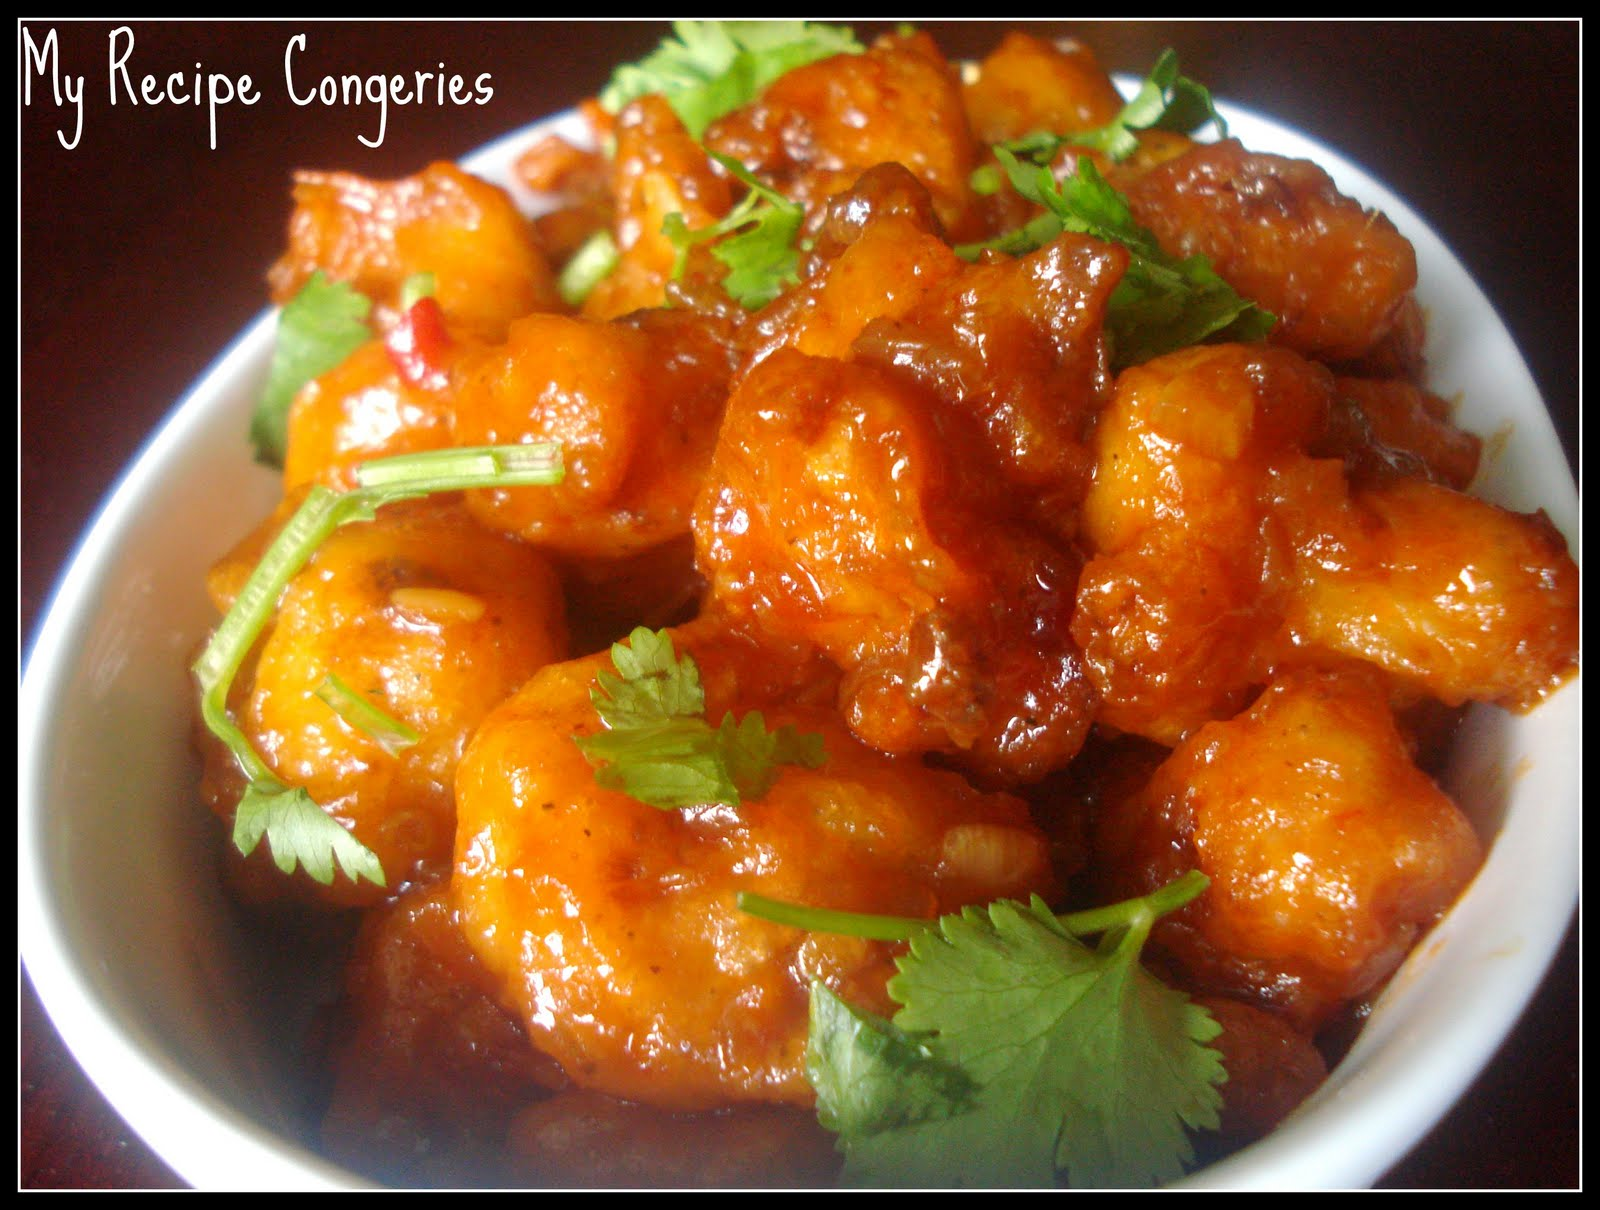 My Recipe Congeries: Gobi Manchurian